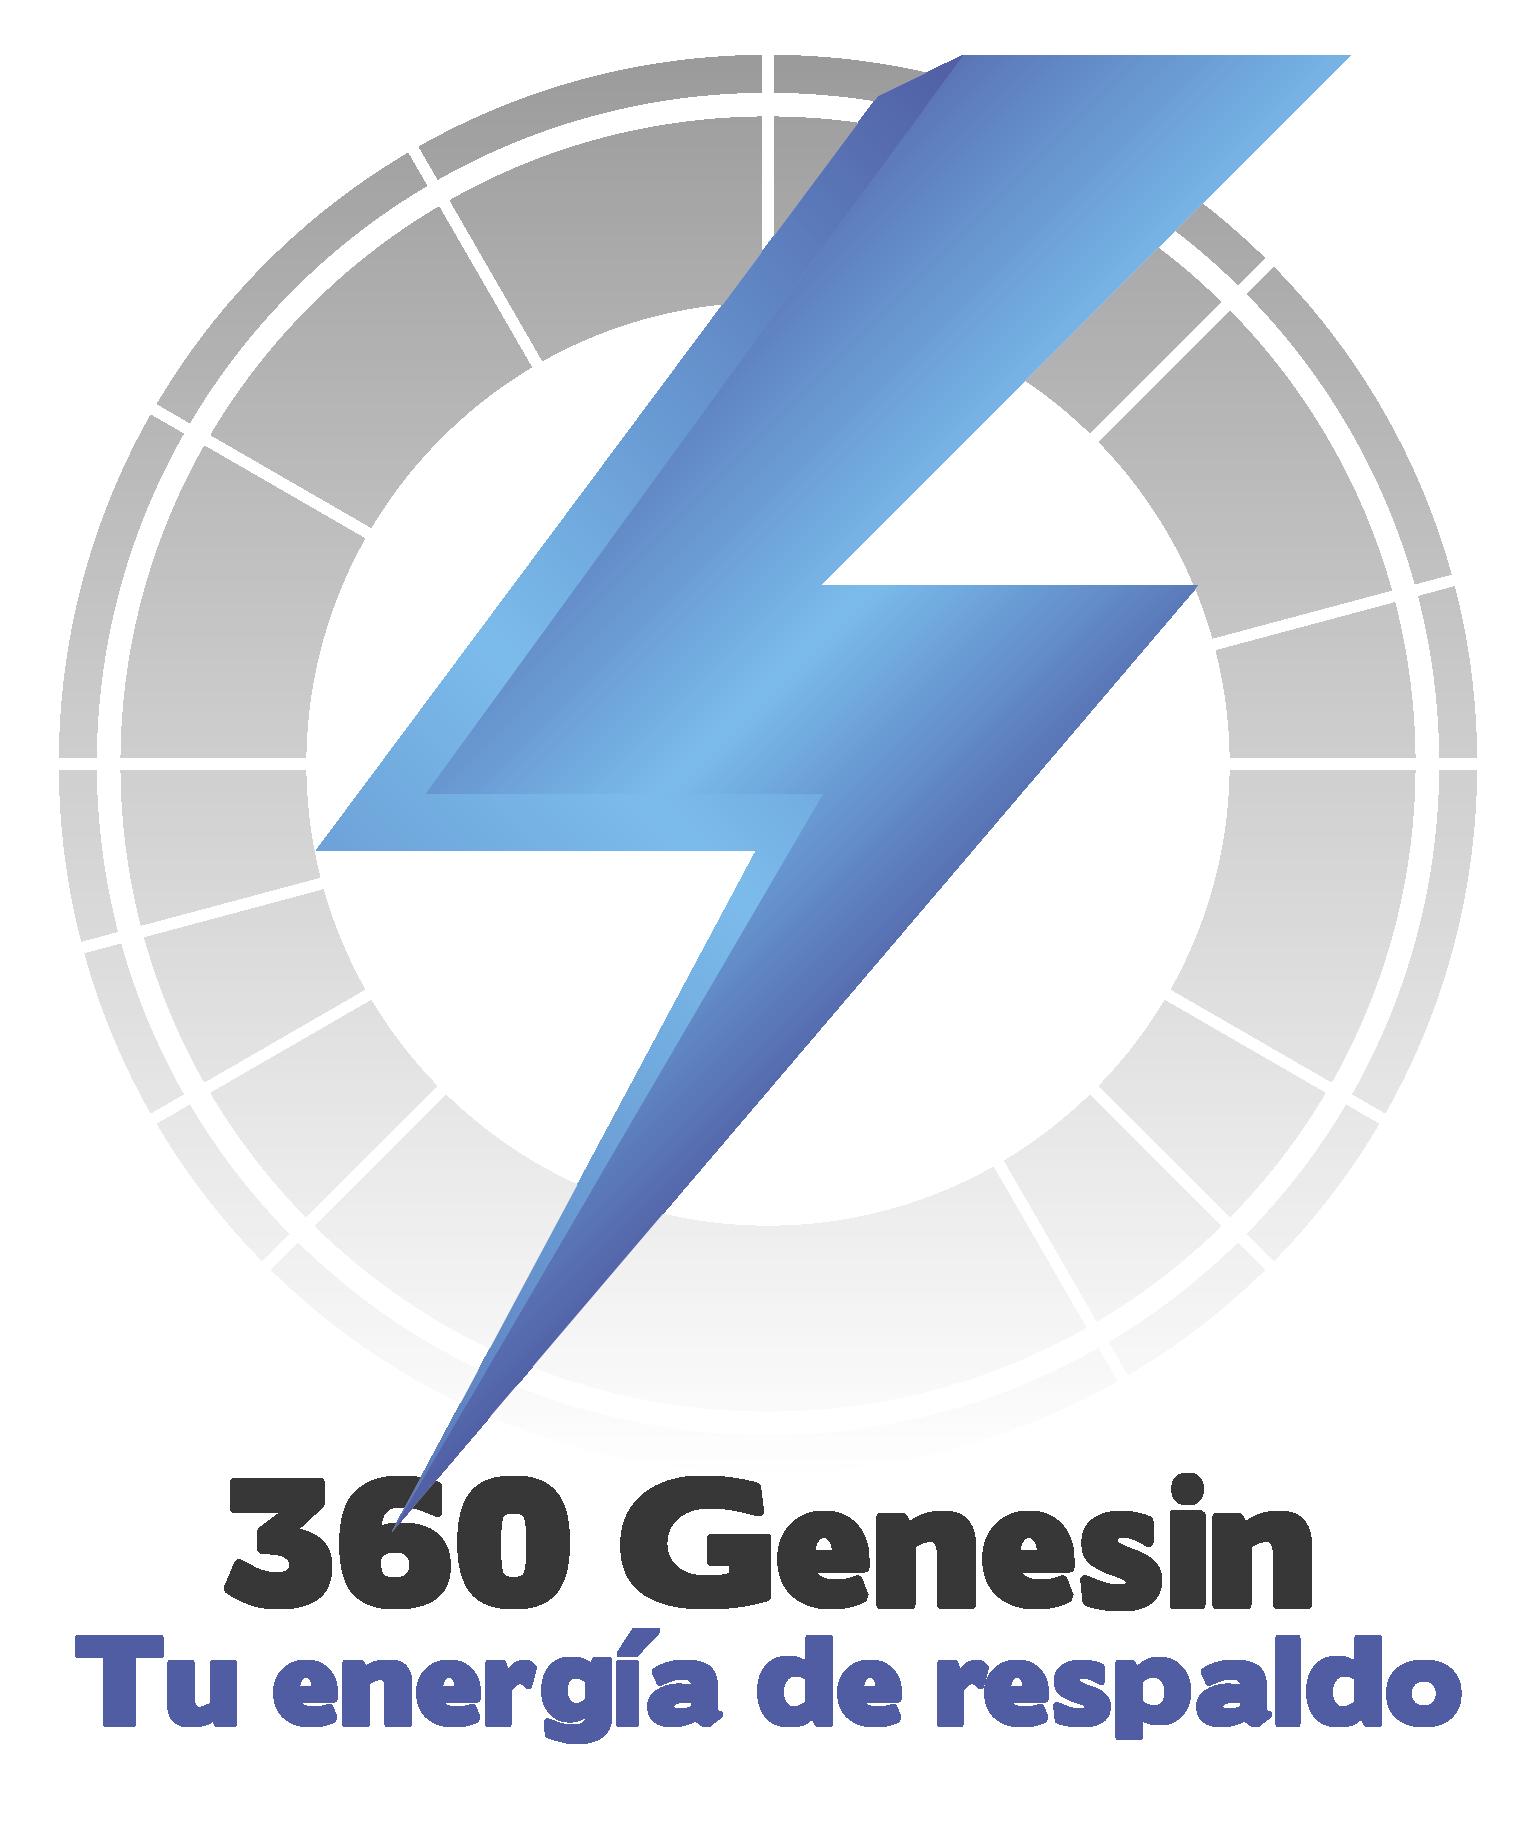 360 Genesin